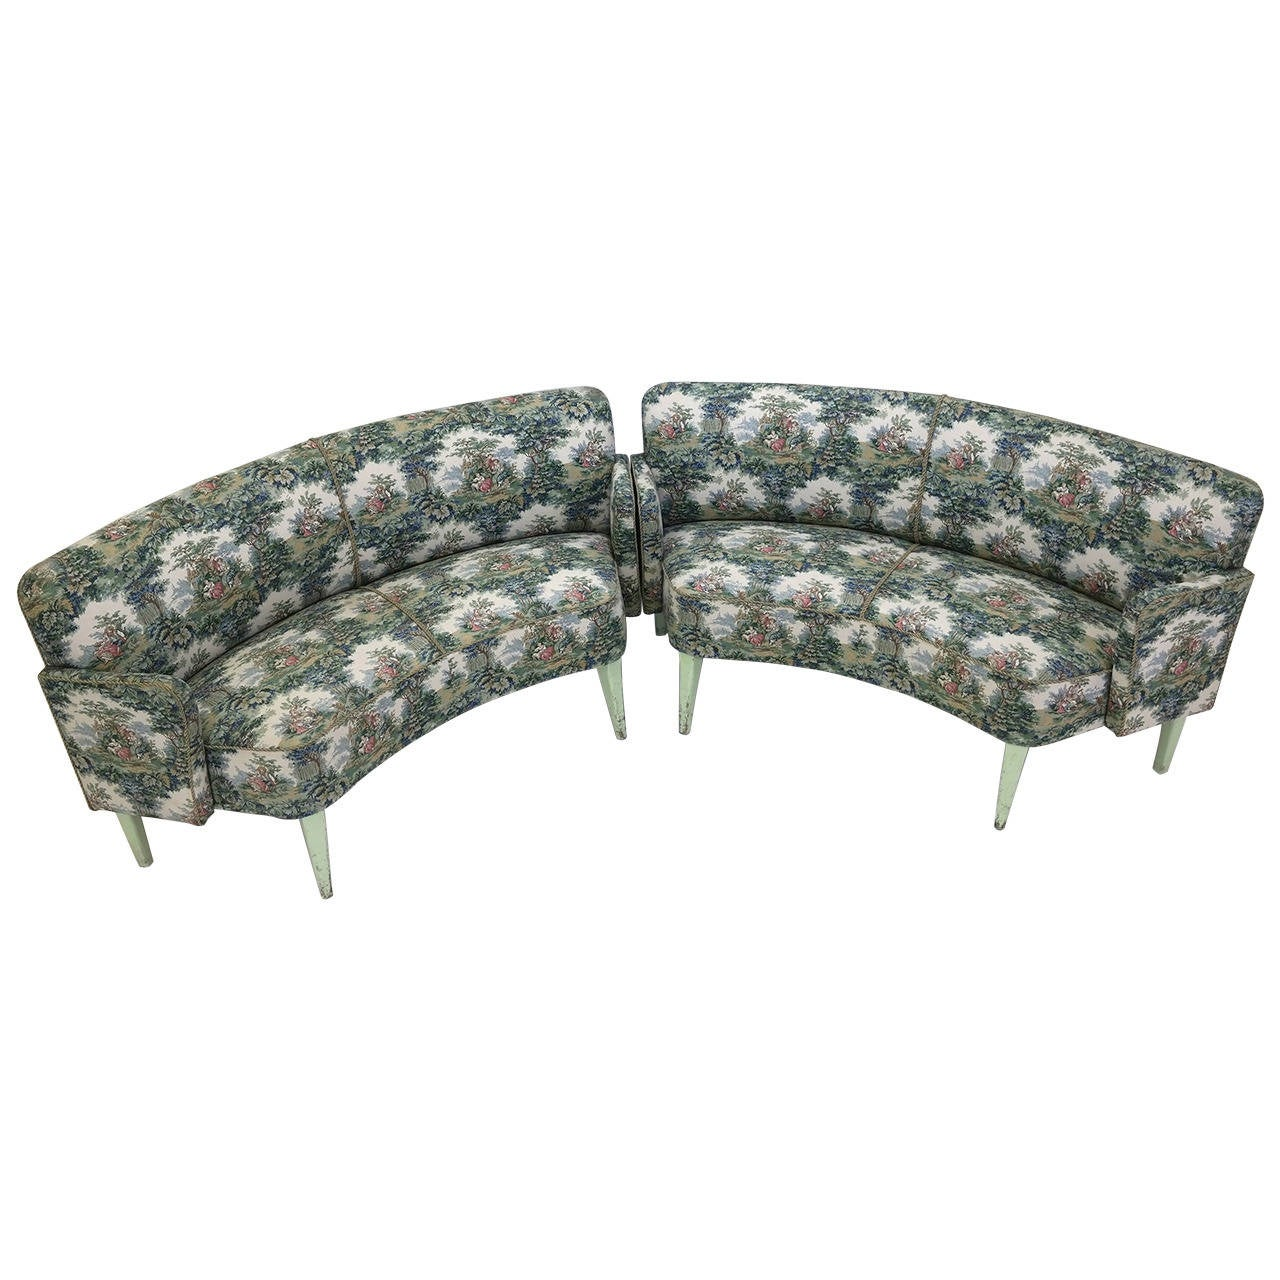 Historical sofas from divan two in tivoli garden copenhagen for Divan 2 tivoli